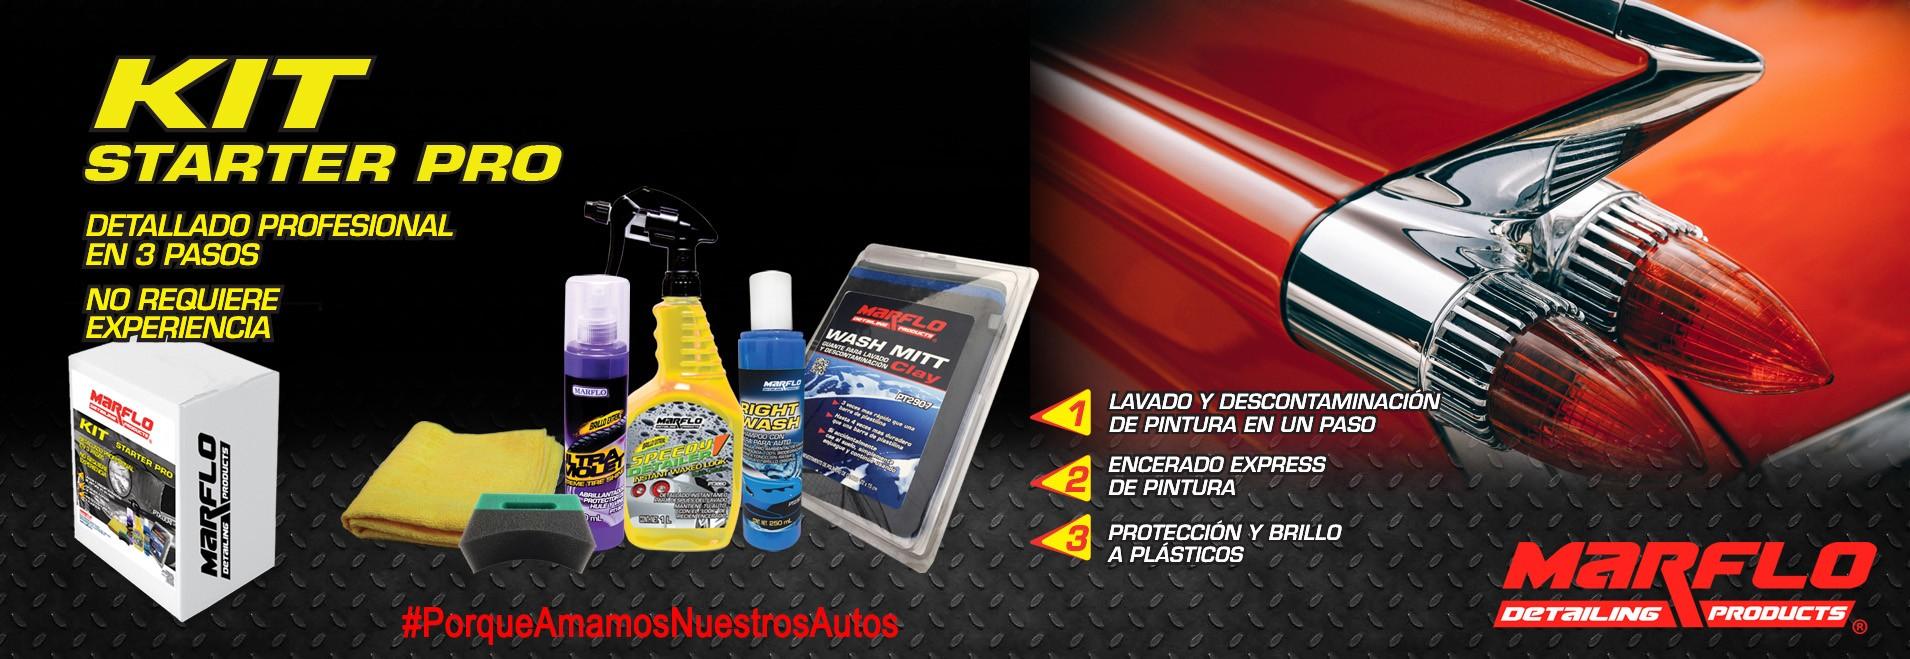 promociones marflo, detailing products, kit starter pro